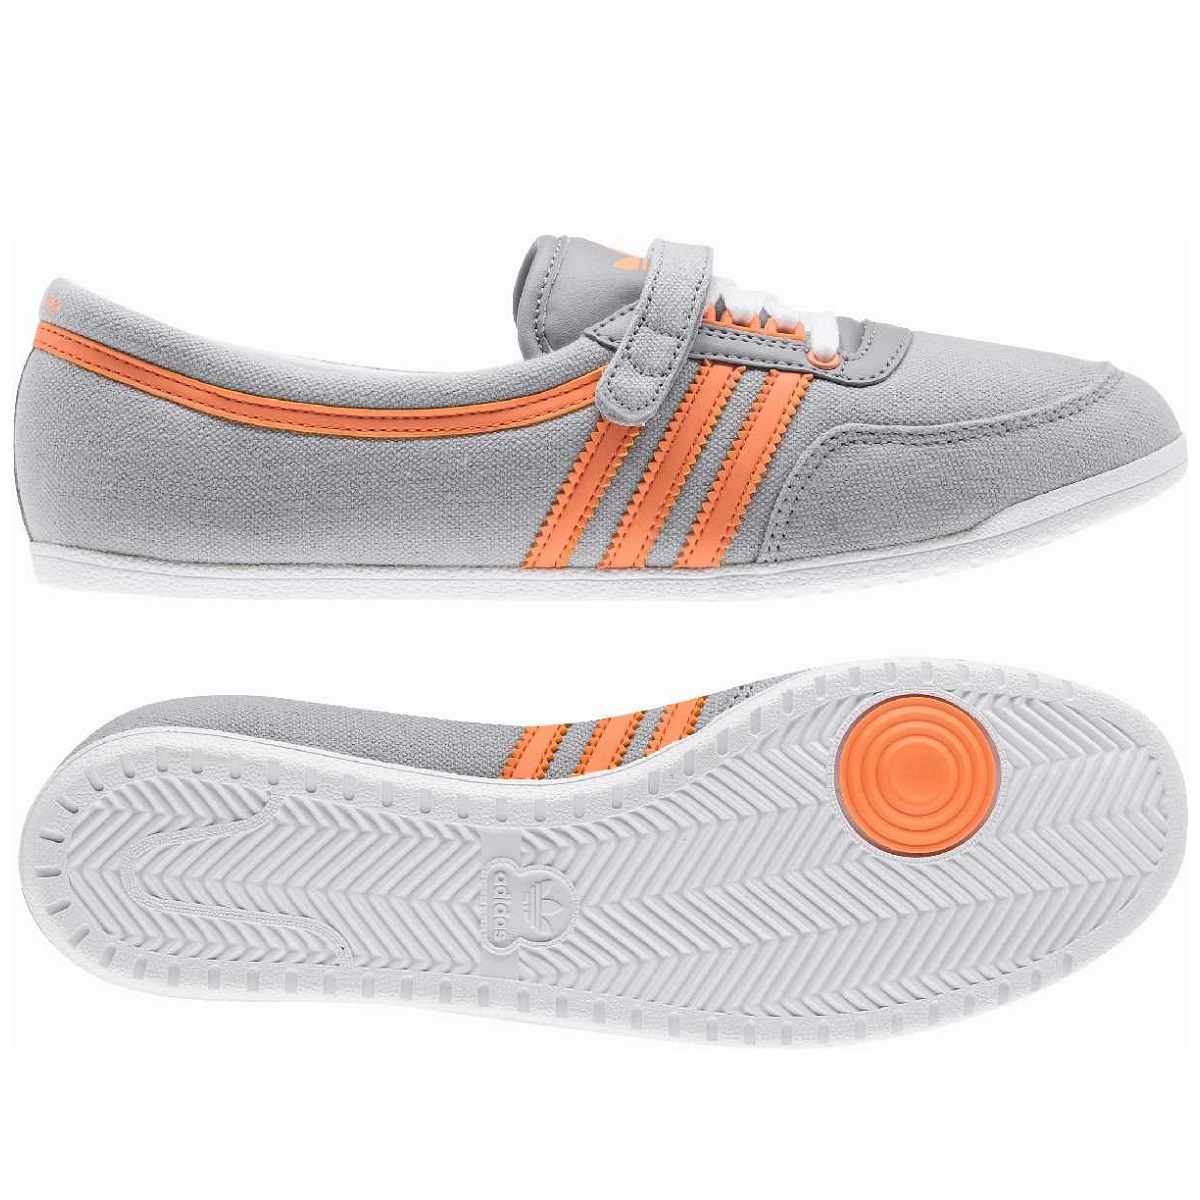 Adidas Schuhe Damen Concord nordsturm